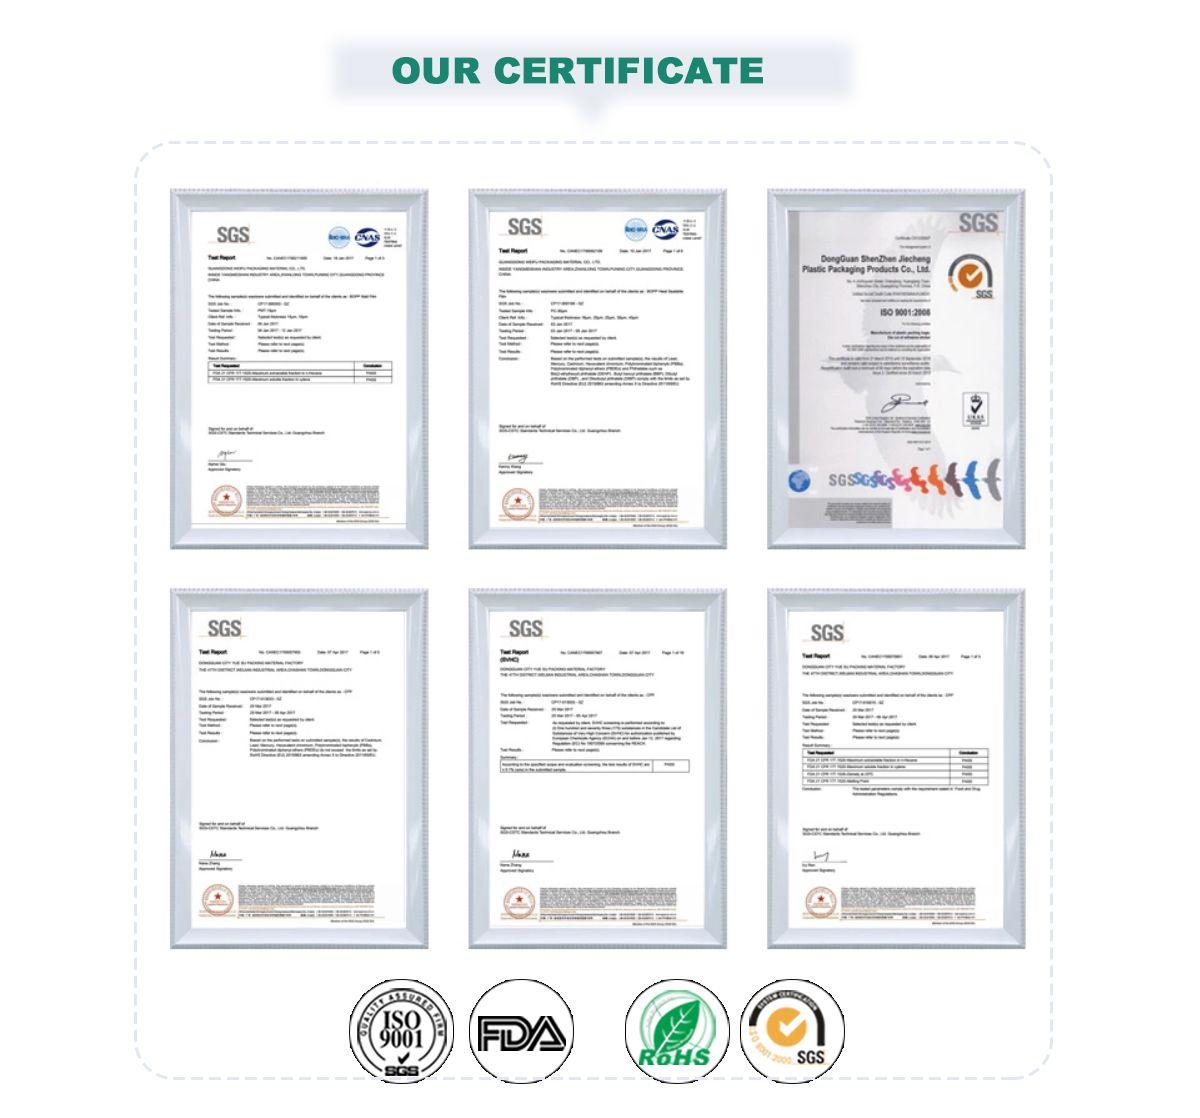 Custom Printed Plastic Rolls Wholesale Certificate